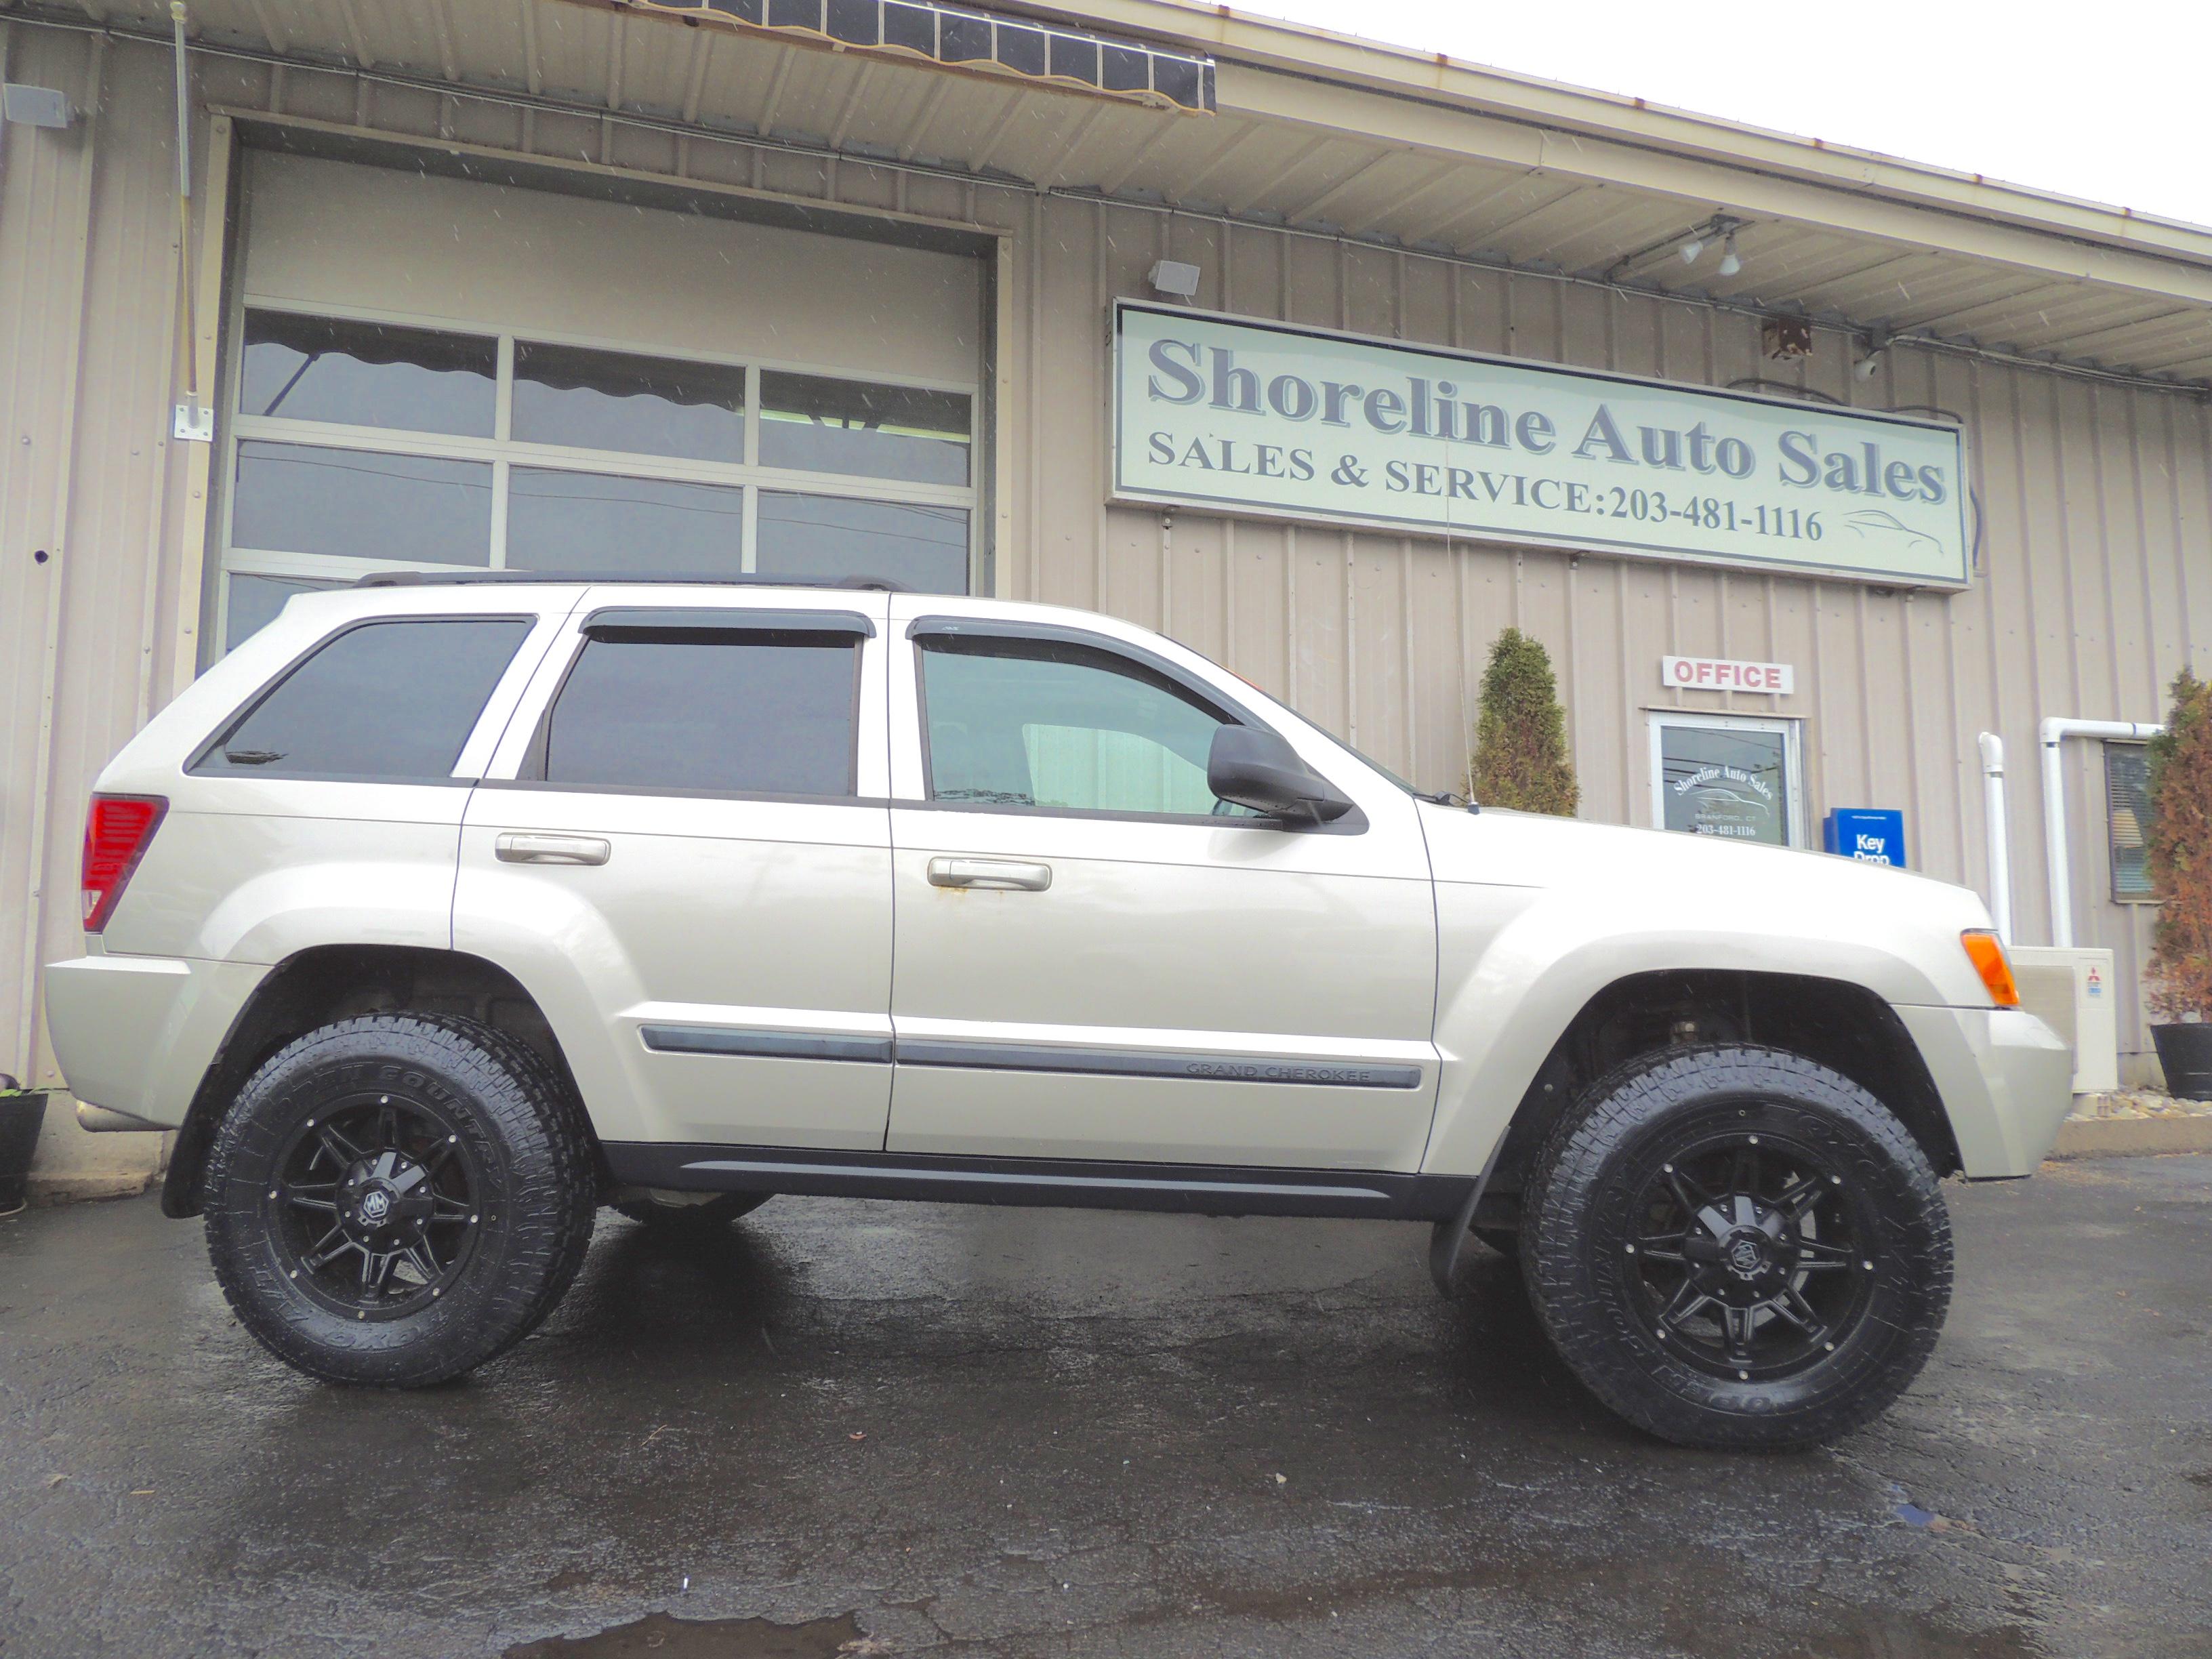 2008 jeep grand cherokee shoreline auto sales. Black Bedroom Furniture Sets. Home Design Ideas